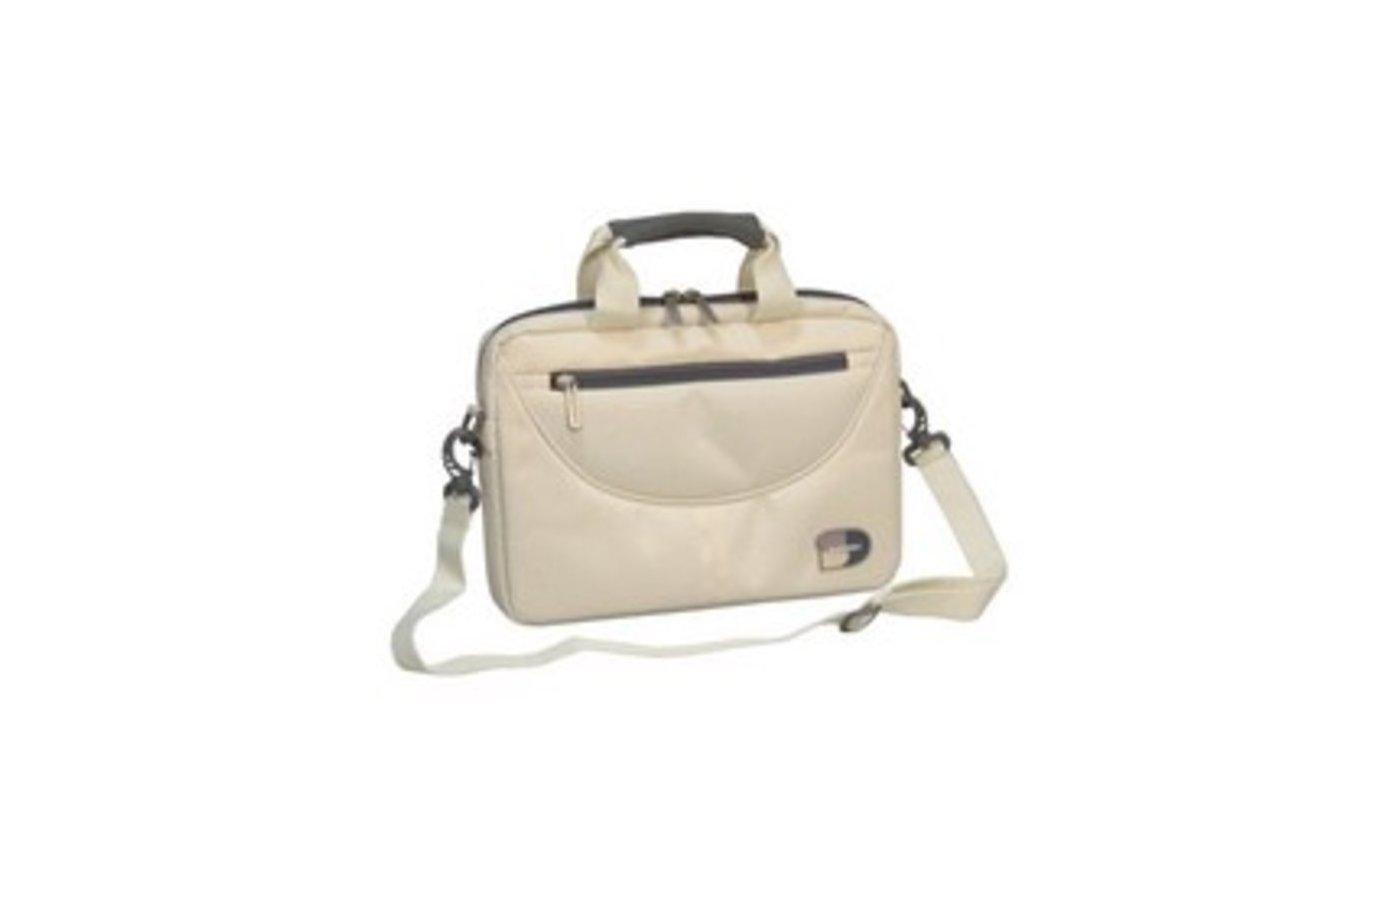 Кейс для ноутбука Sumdex PON-308CM Netbook Case до 10 (нейлон/полиэстер, белый, 29,8 х 21 х 5,1 см.)